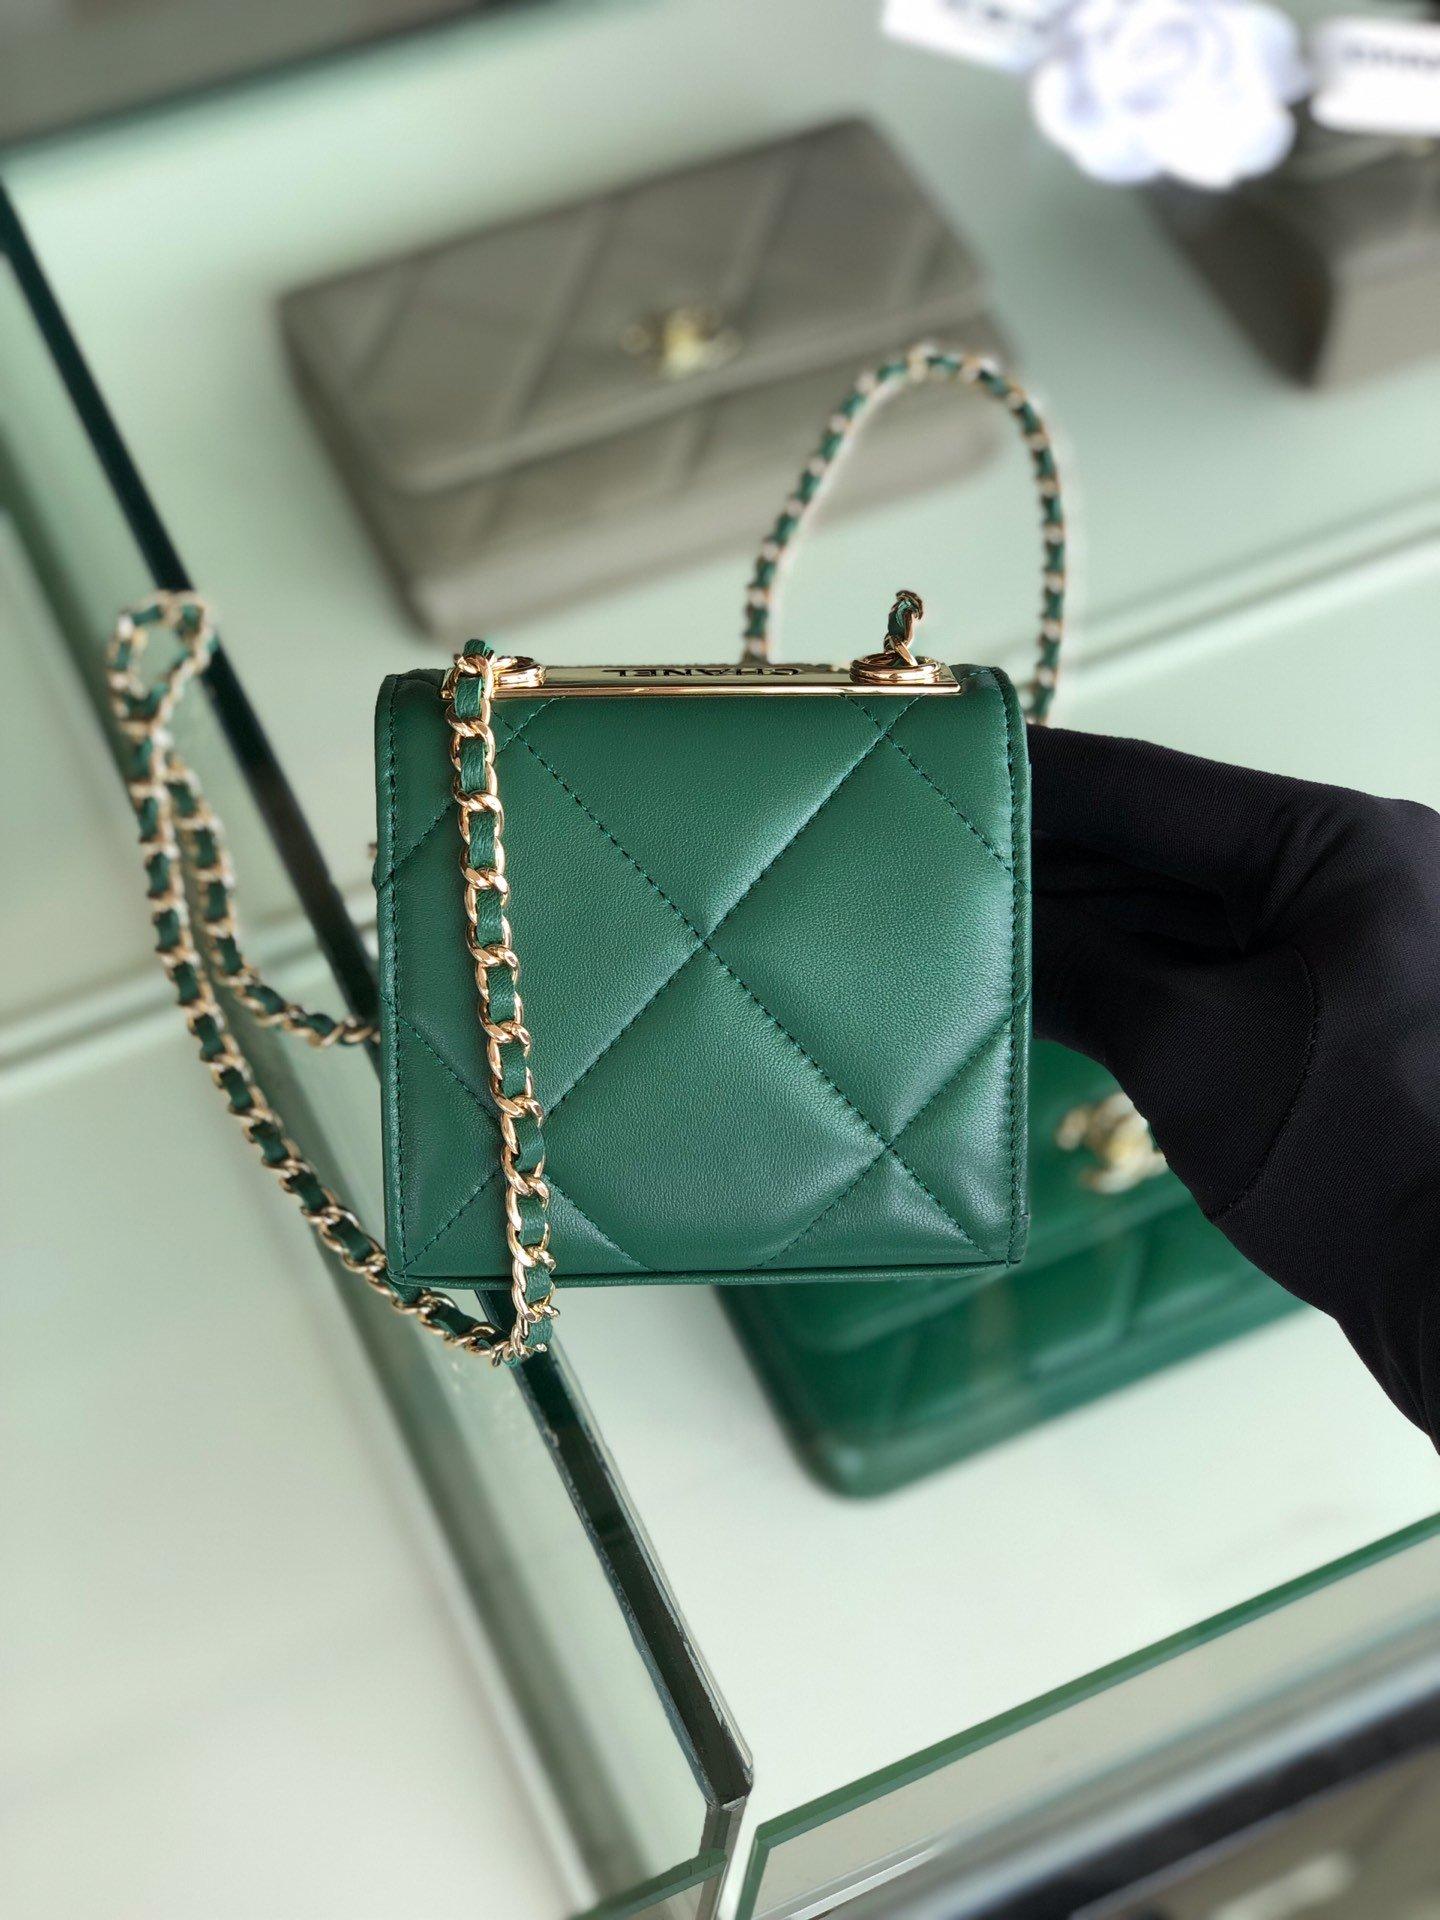 Chanel香奈儿专柜同款 大方格新款零钱包 单肩斜挎(图2)